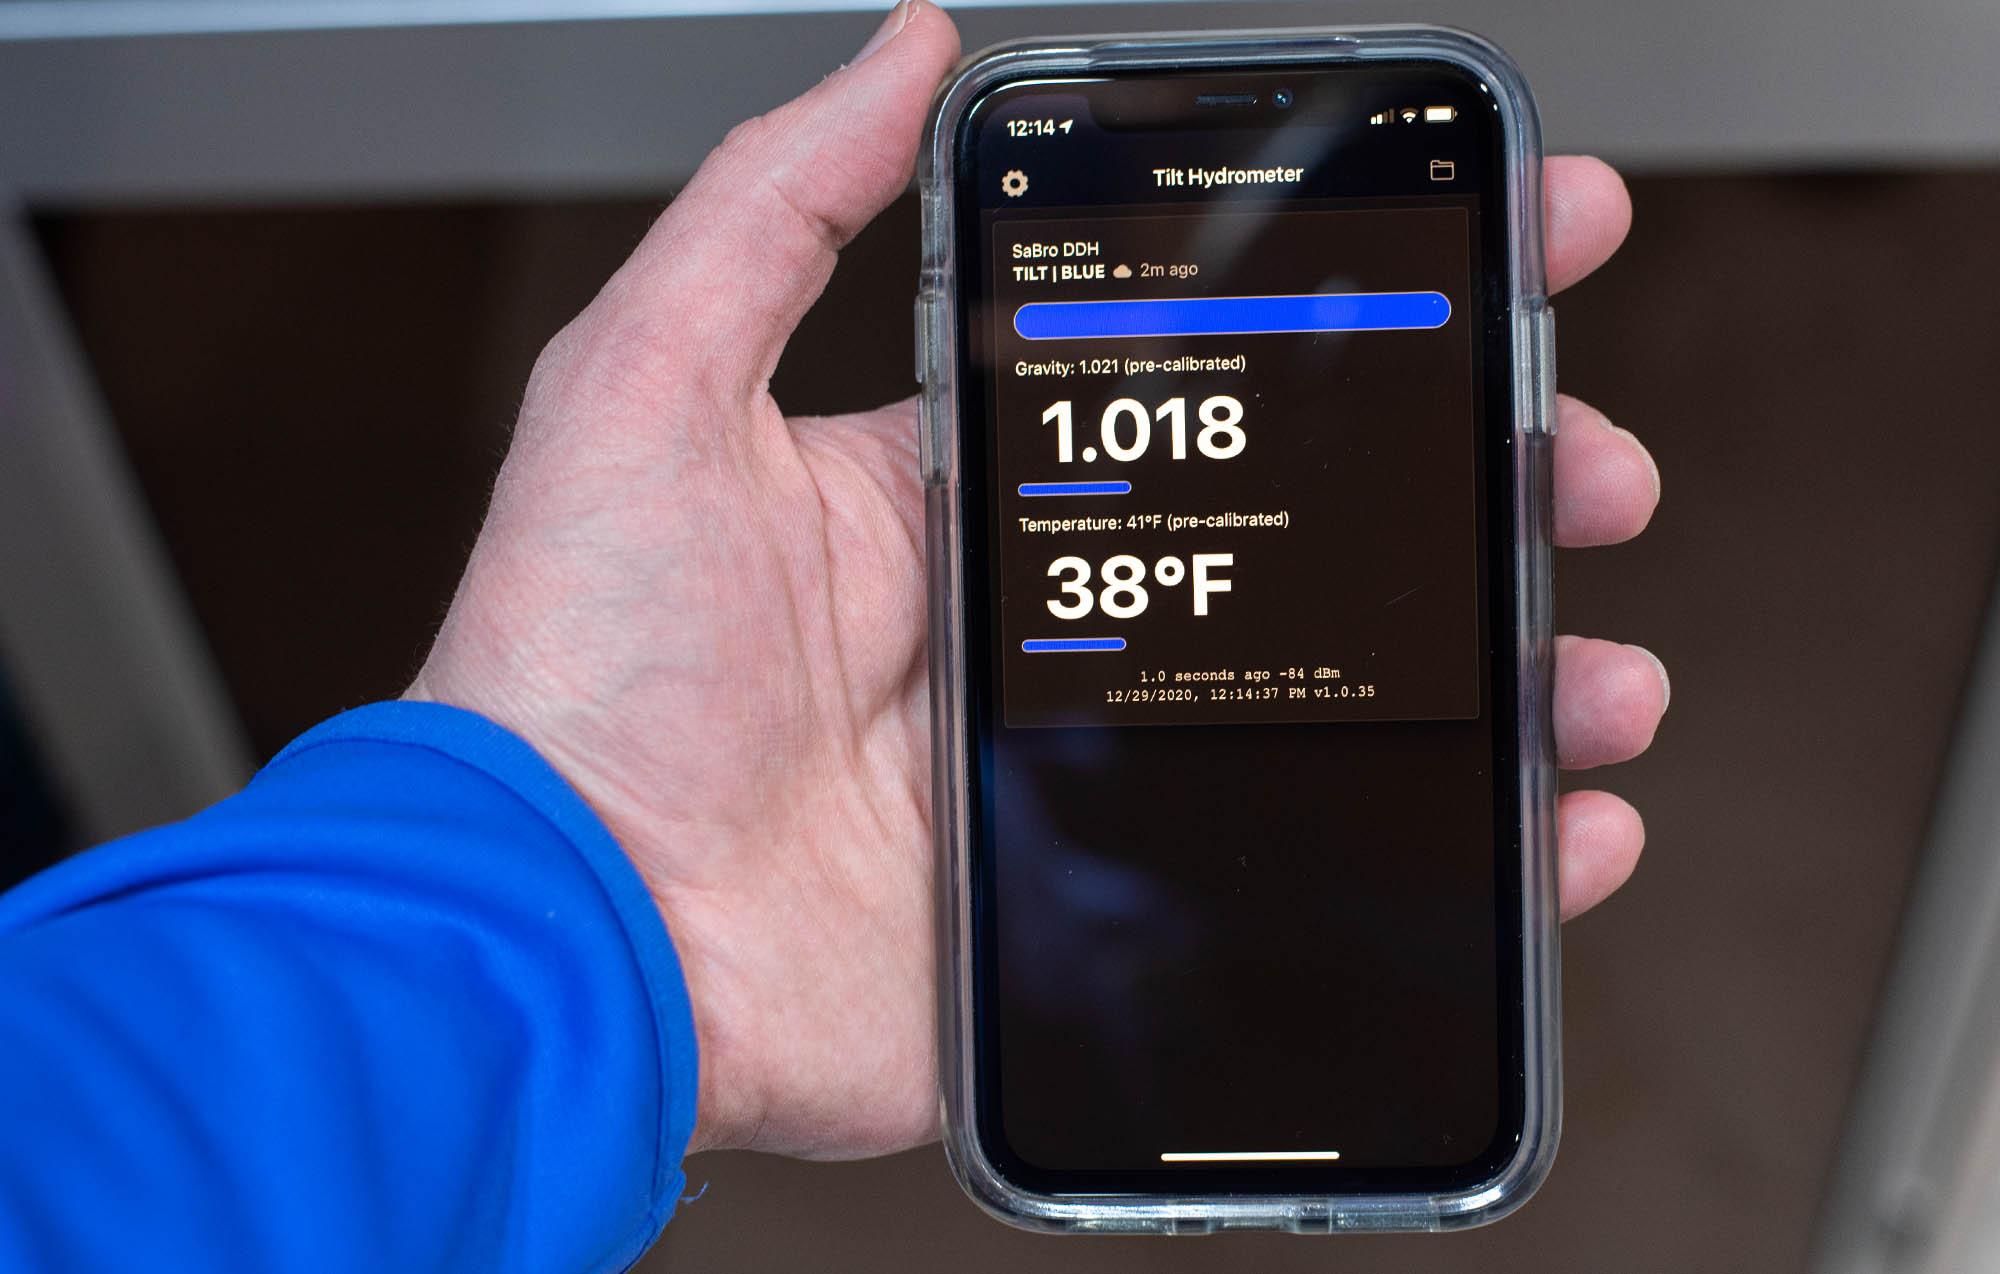 Tilt hydrometer with smart phone